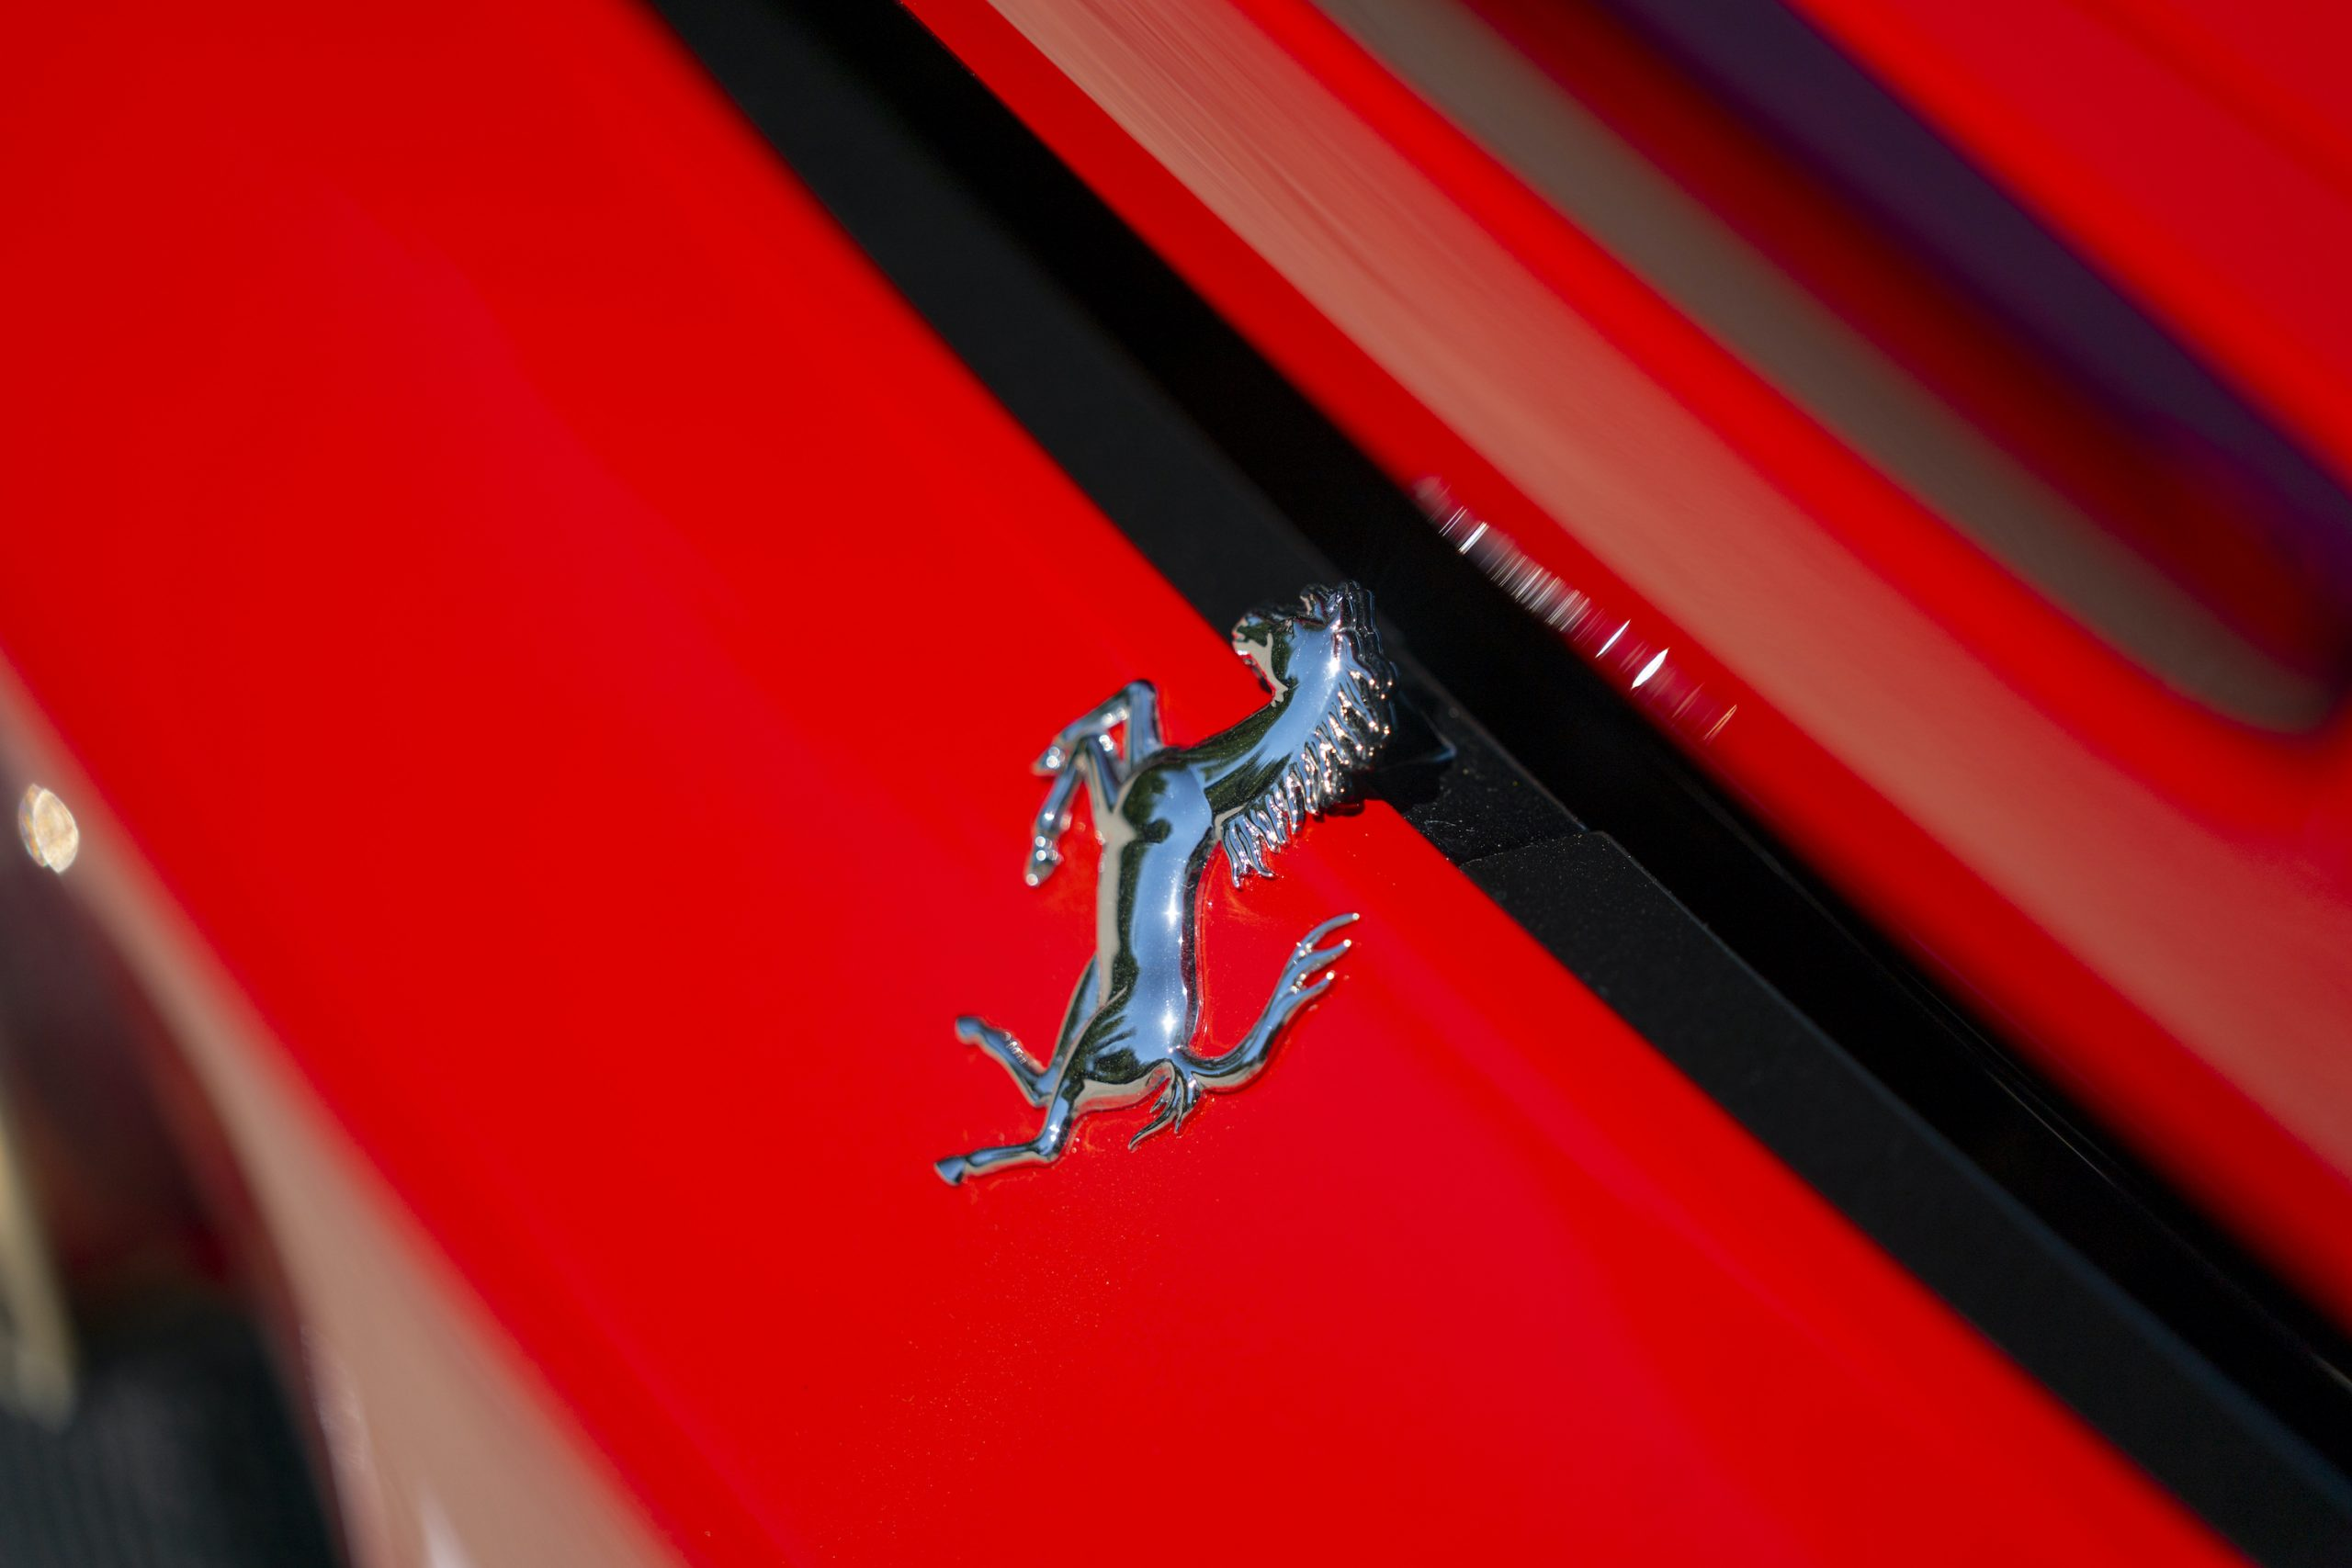 SF90 Stradale prancing horse logo silver